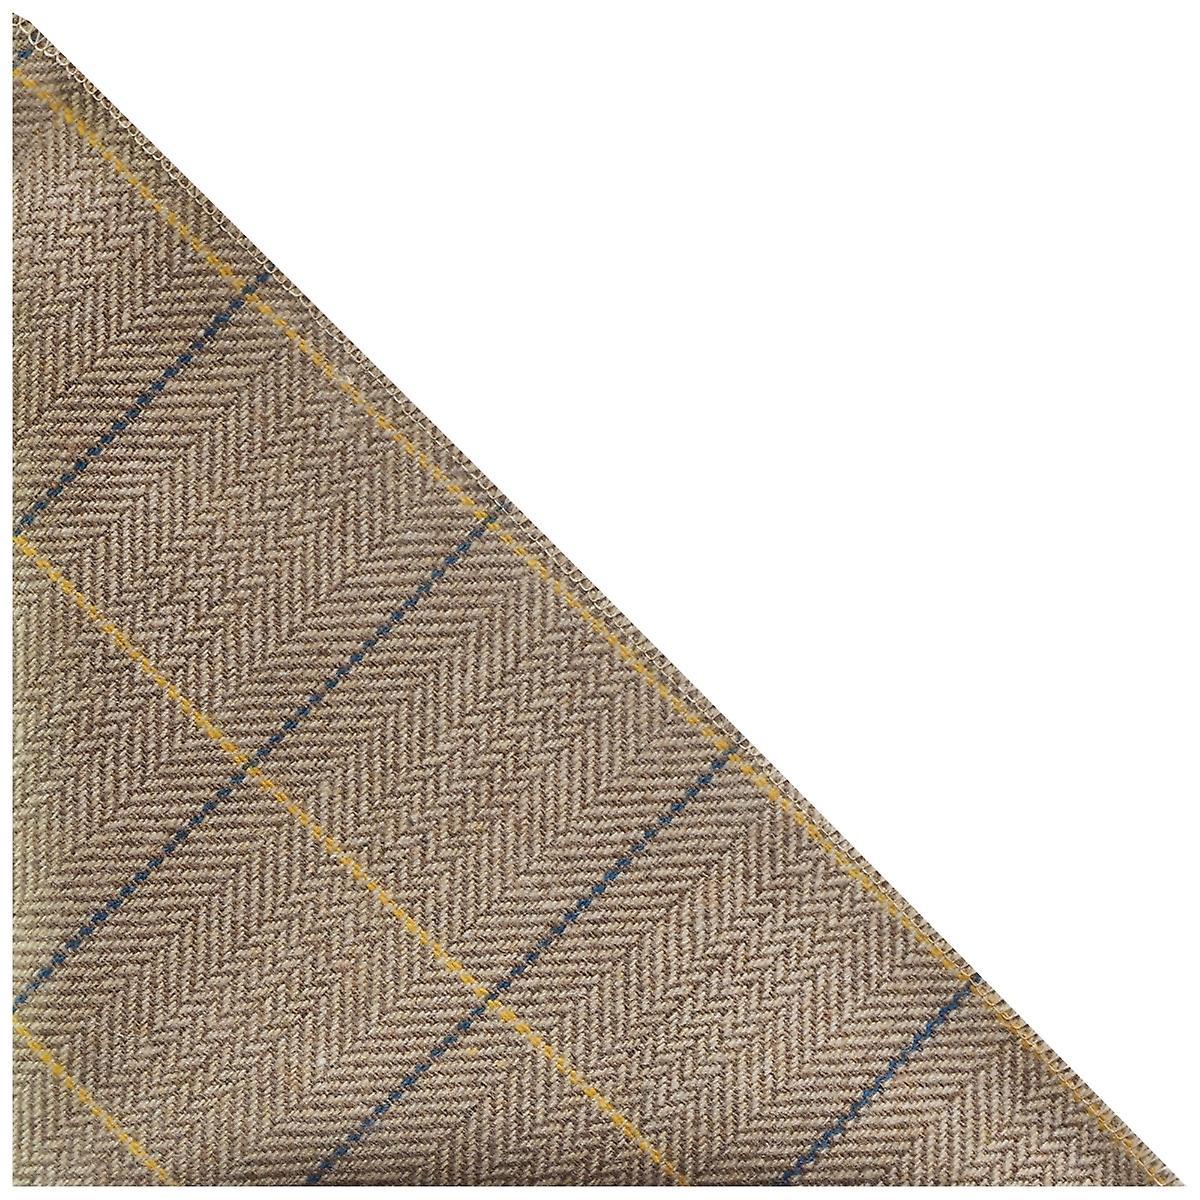 Luxury Light Oak Herringbone Check Pocket Square, Handkerchief, Tweed